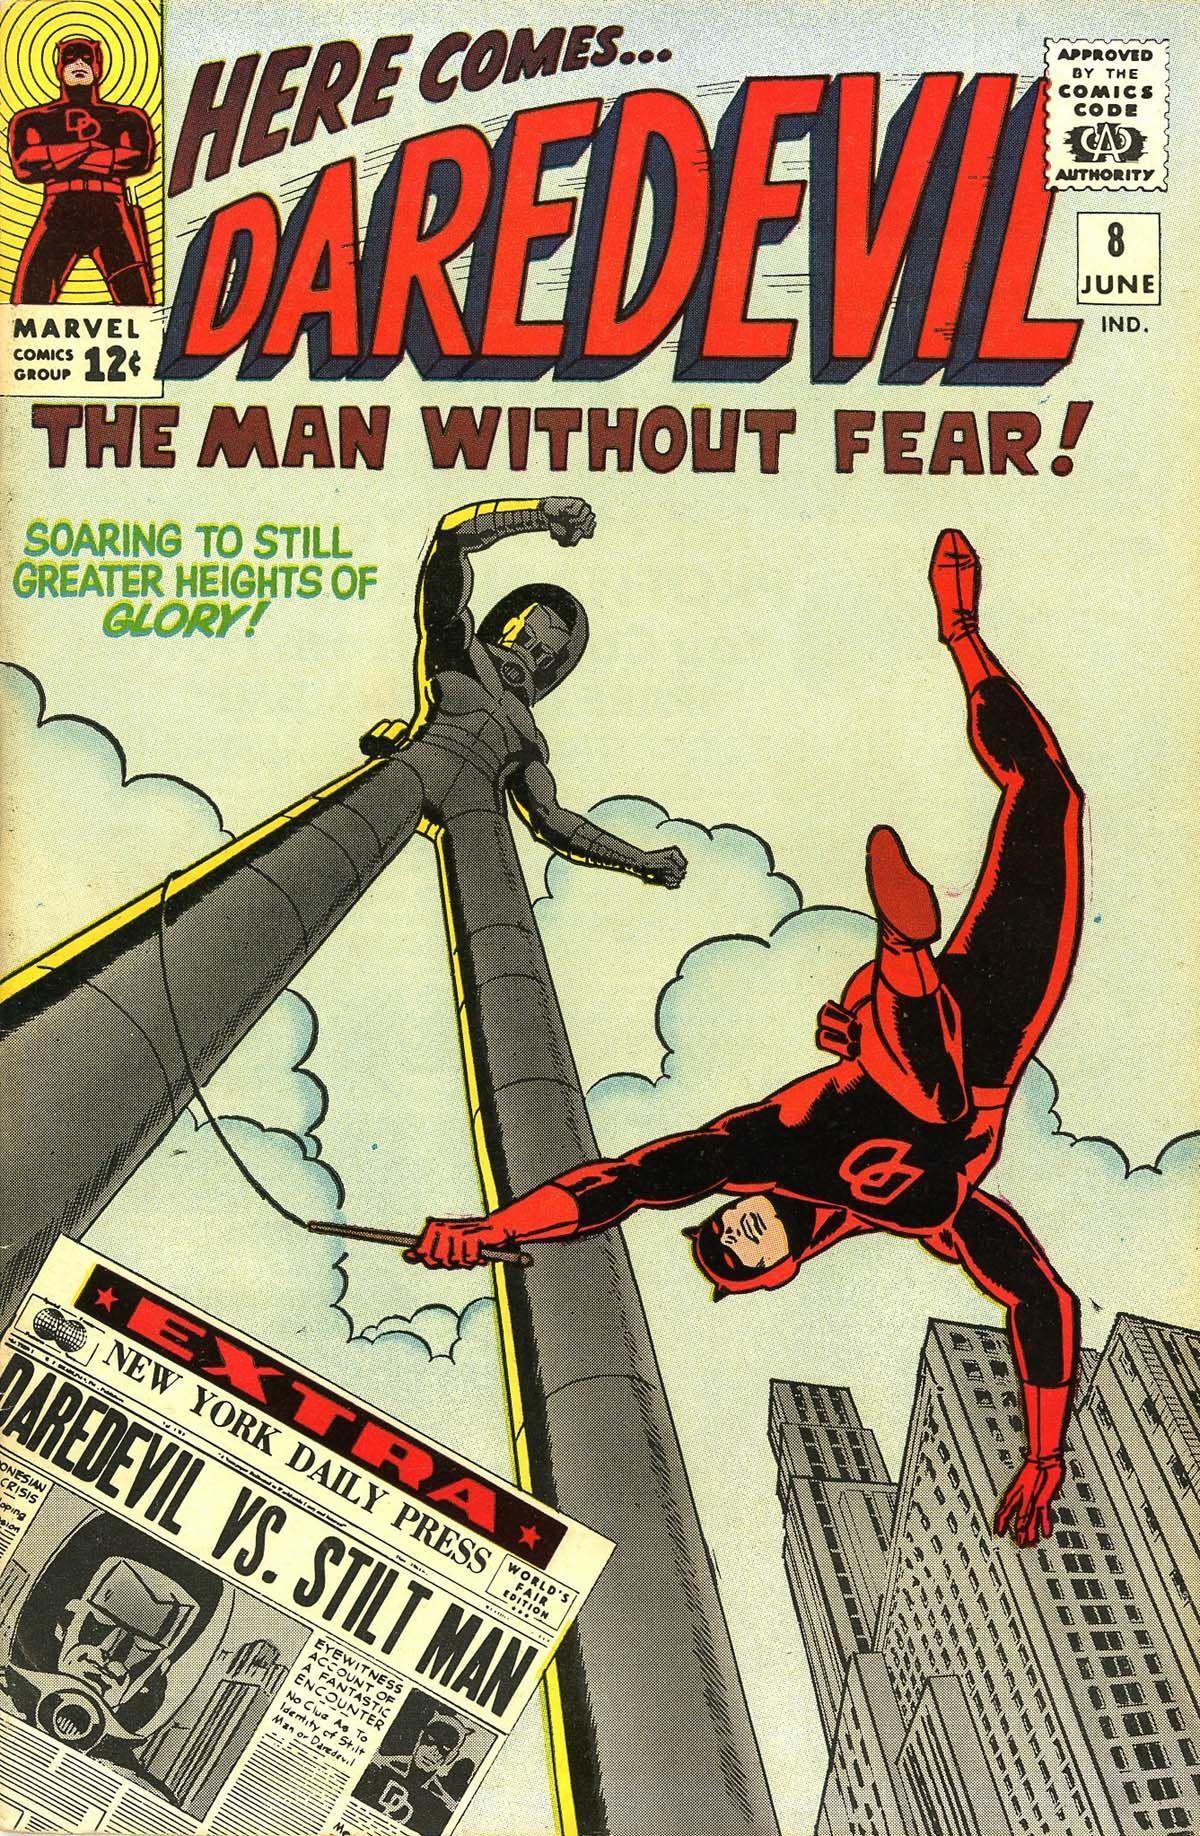 Daredevil 8 june 1965 cover by wally wood daredevil